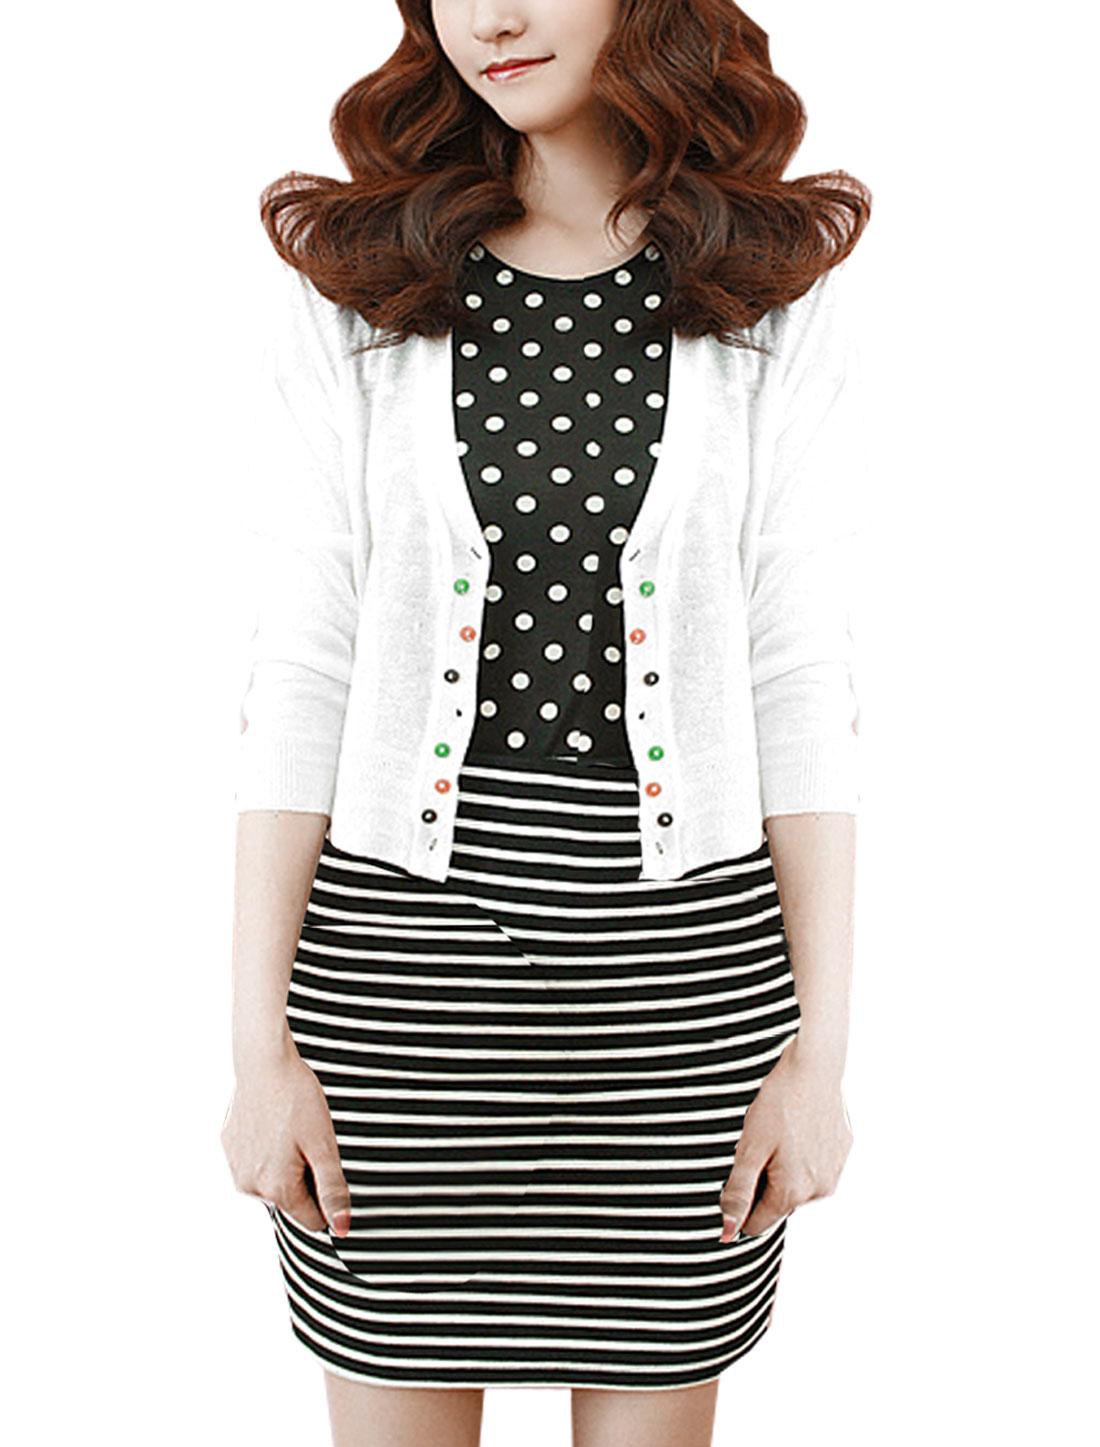 Lady V Neck Long Sleeve Colorful Button Down White Bolero Shrug XL